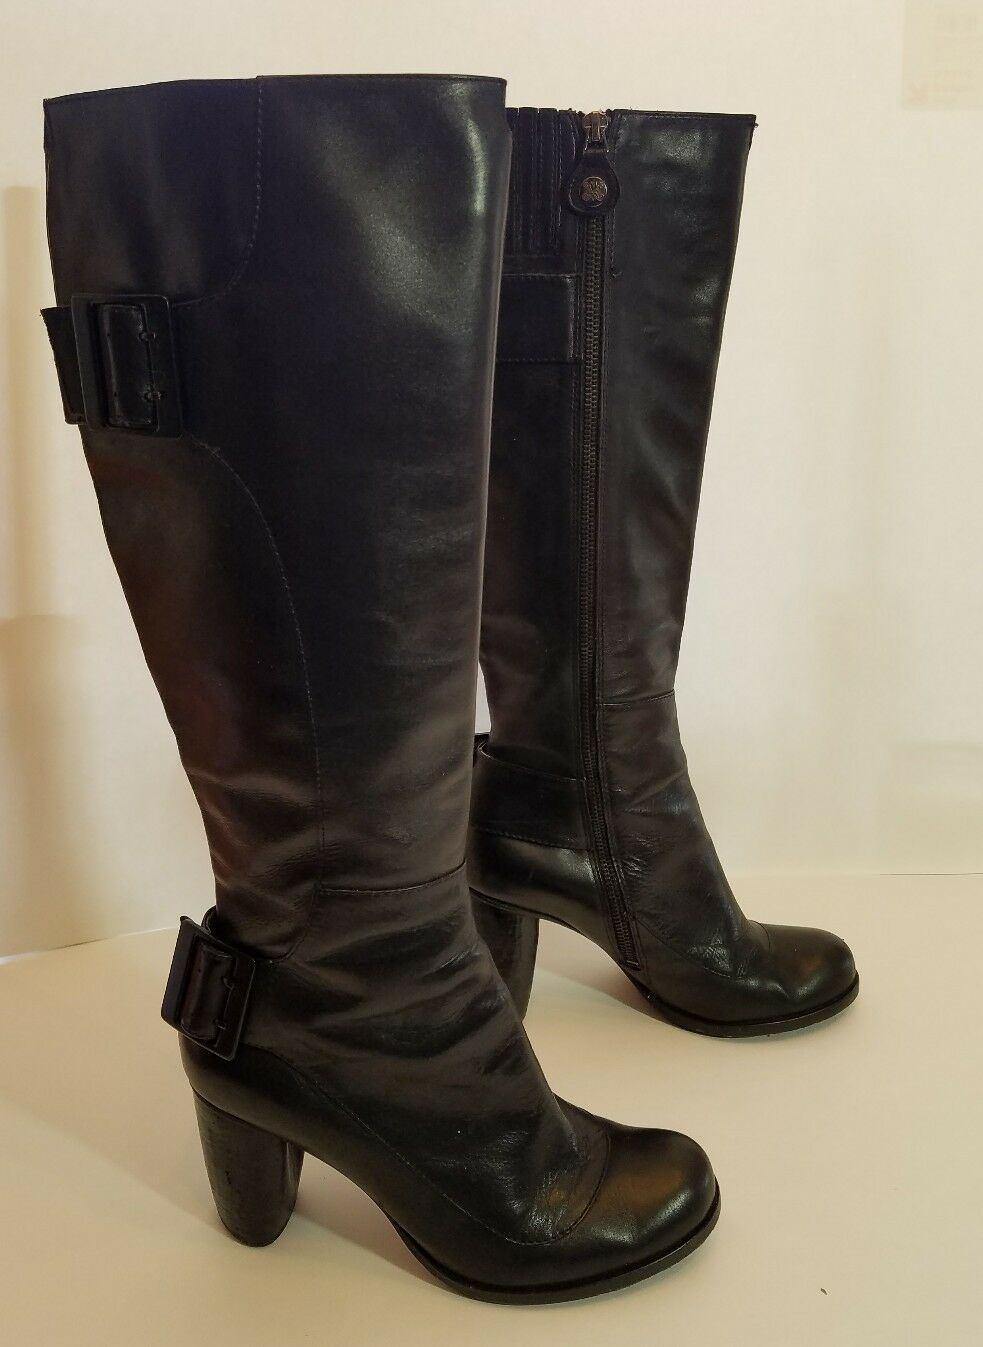 Modern Vintage Damens's tall boots schwarz zipper Größe 37 7 US